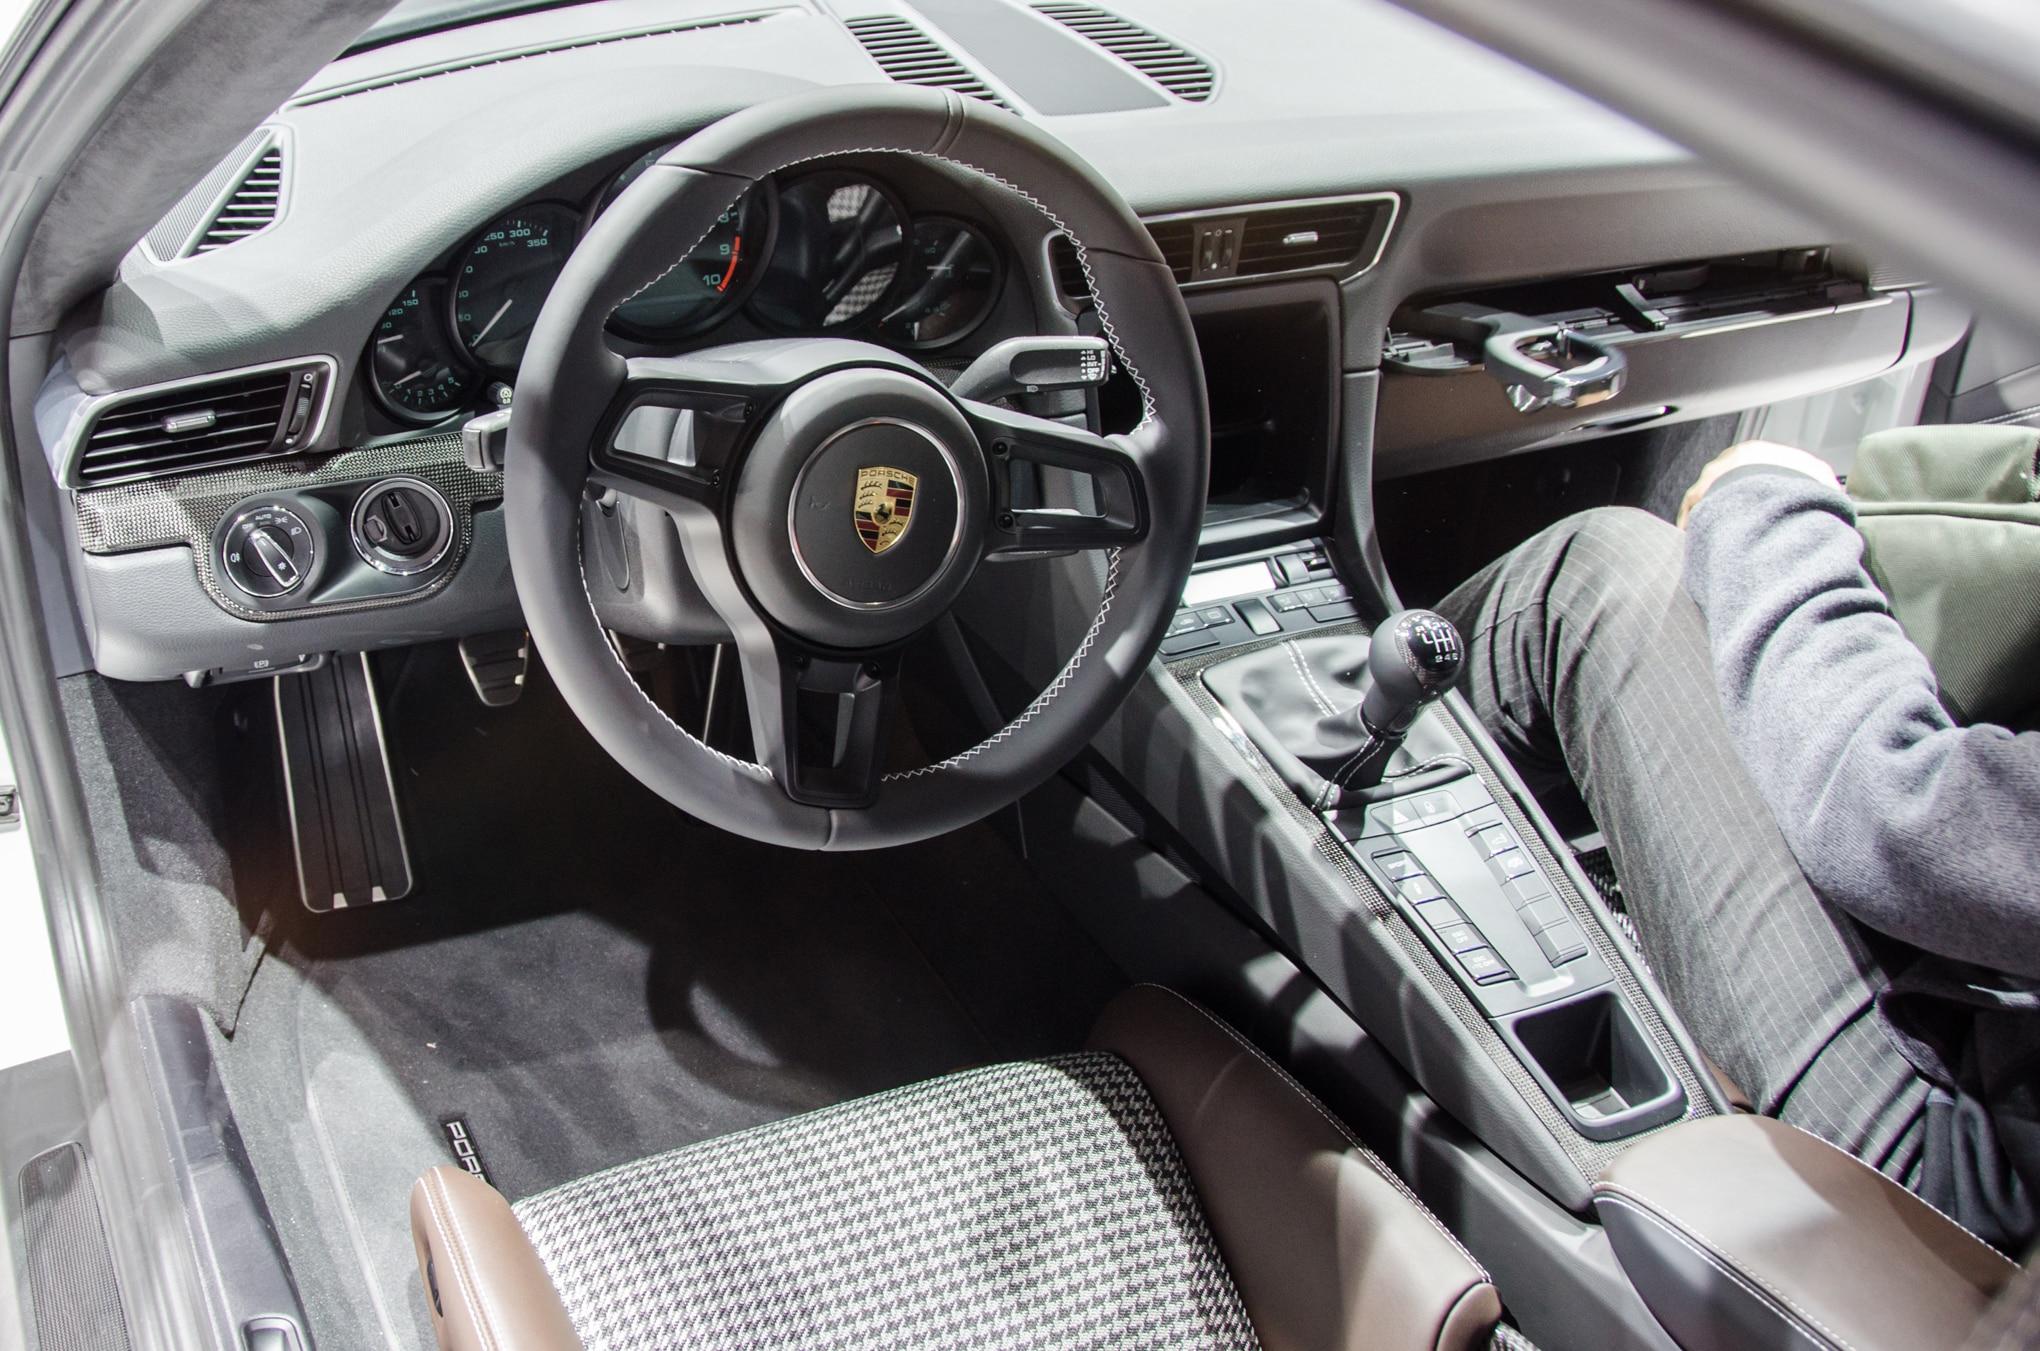 Porsche 911 r revealed with 500 hp lightweight body 6 for Porsche 911 interieur